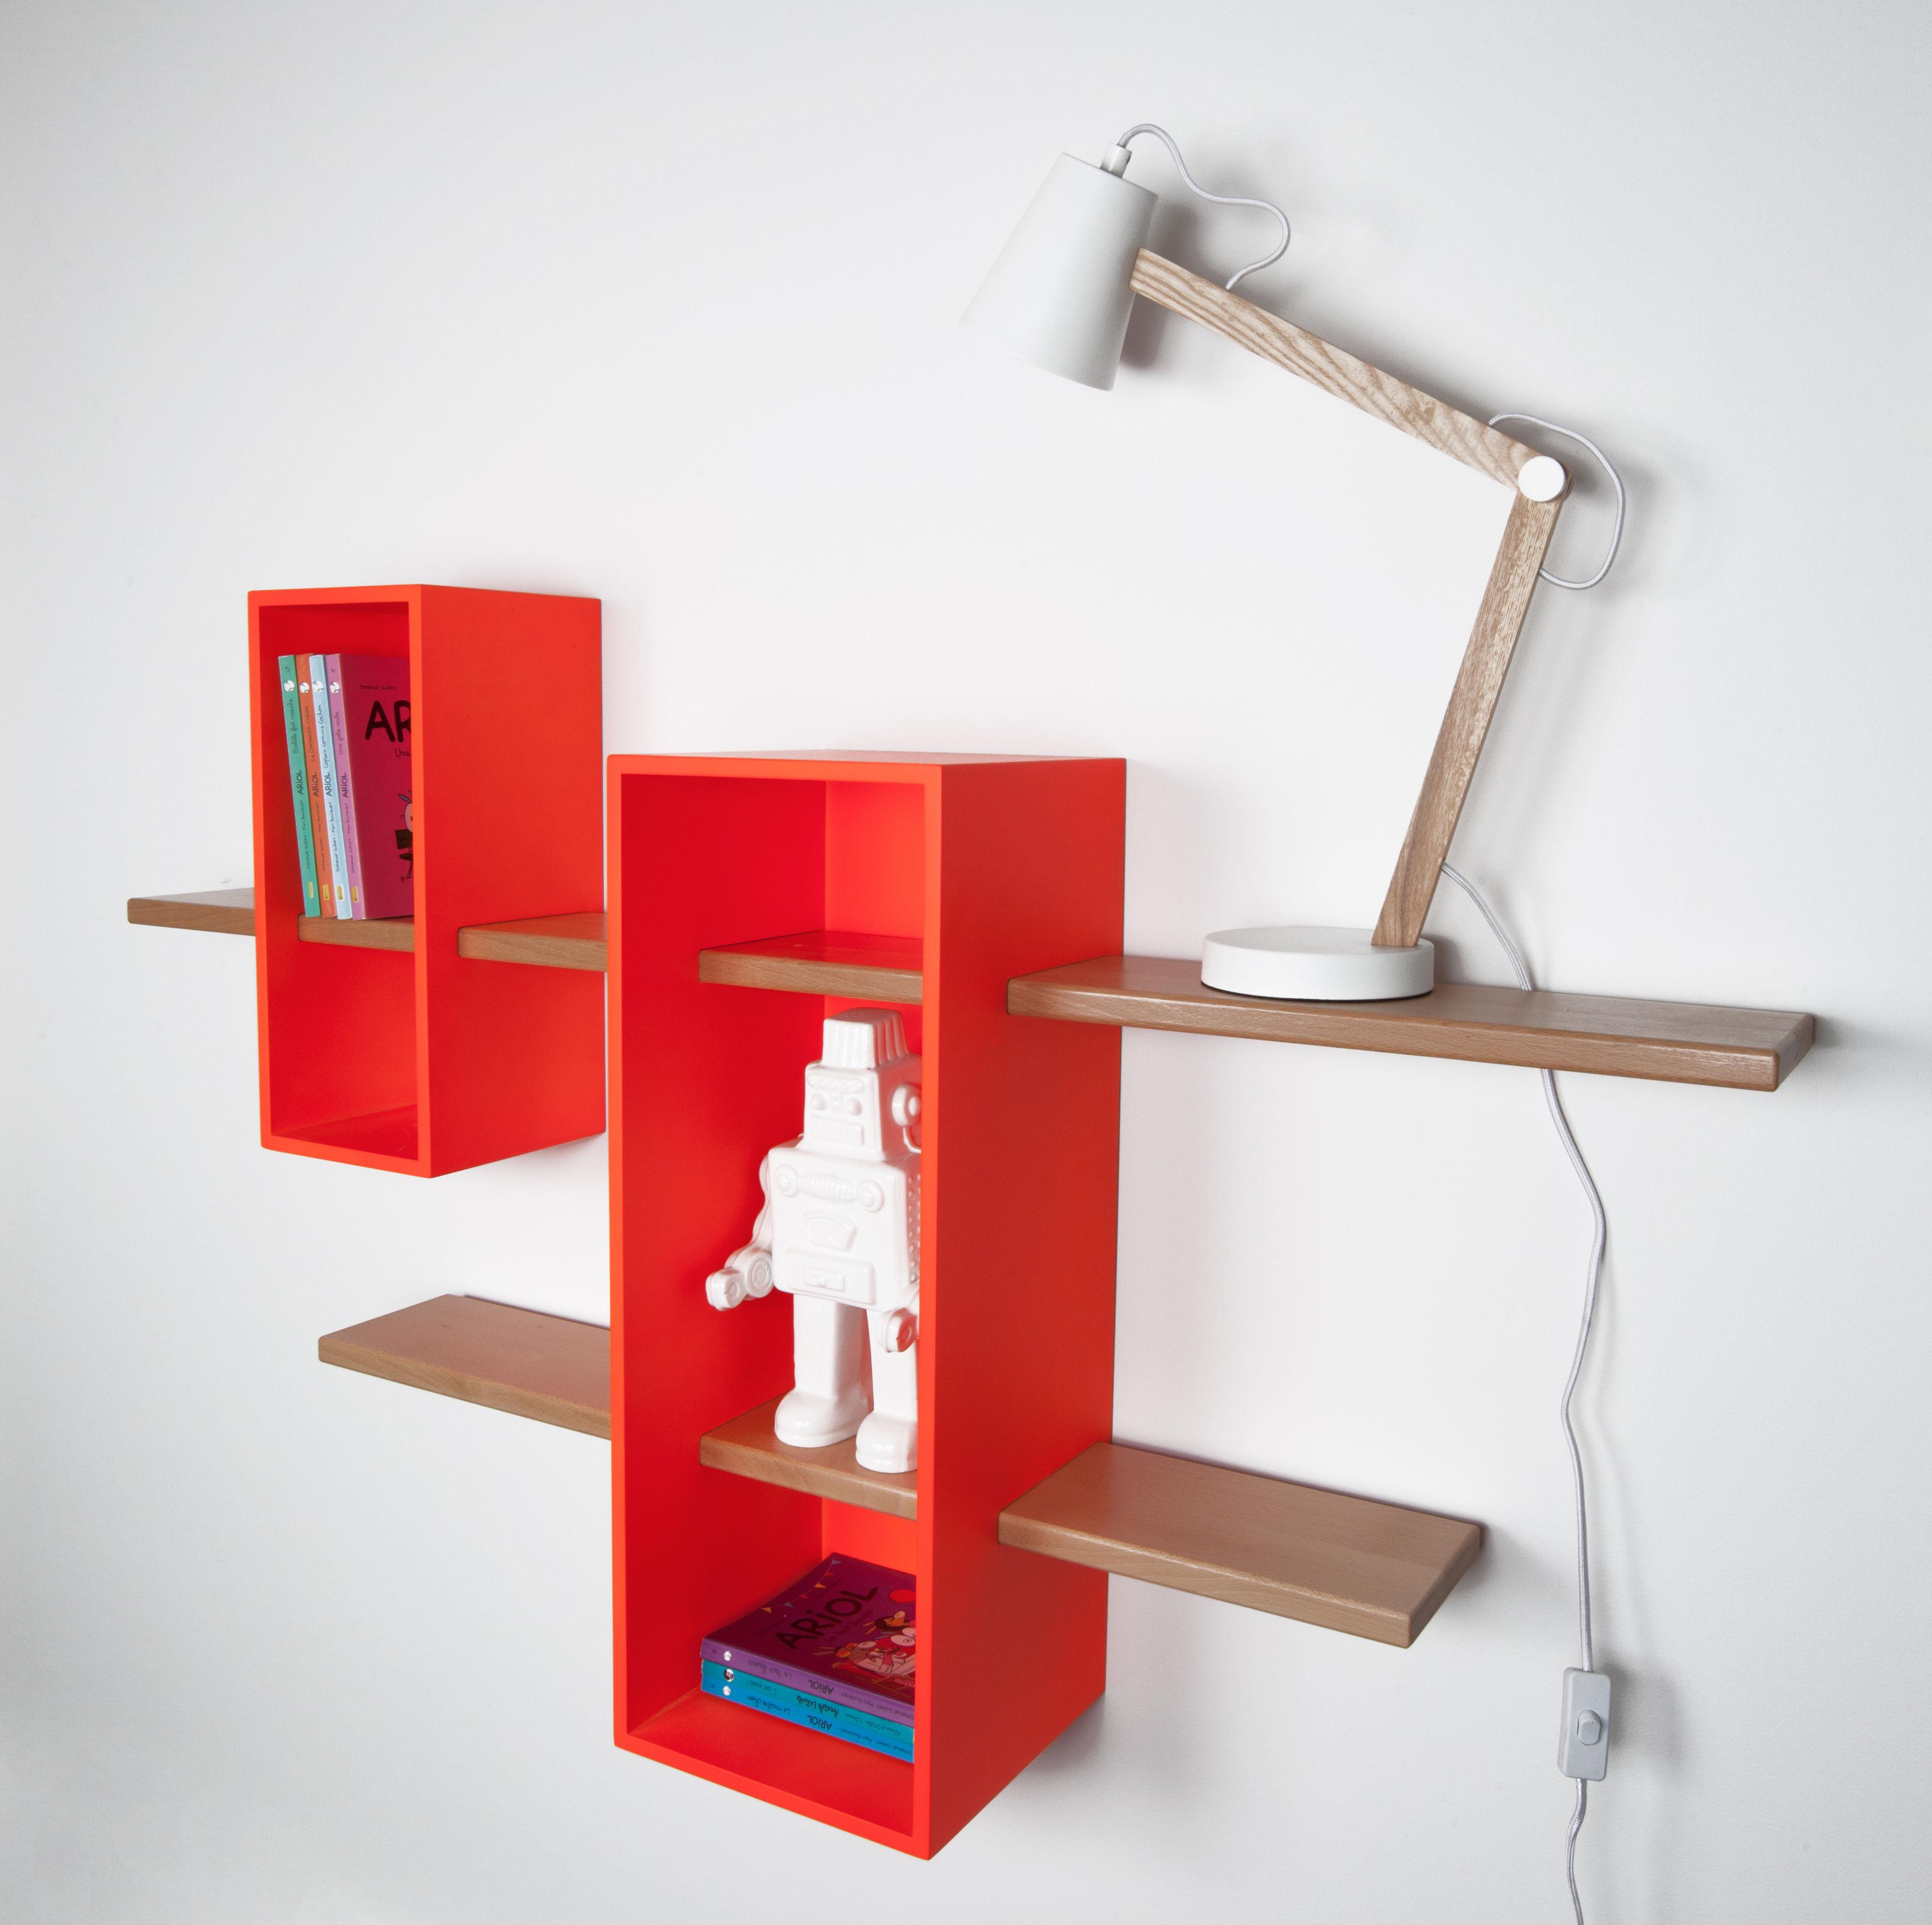 Max shelf double exclusive colour orange luminous by - Exclusive decoration of book shelf ...